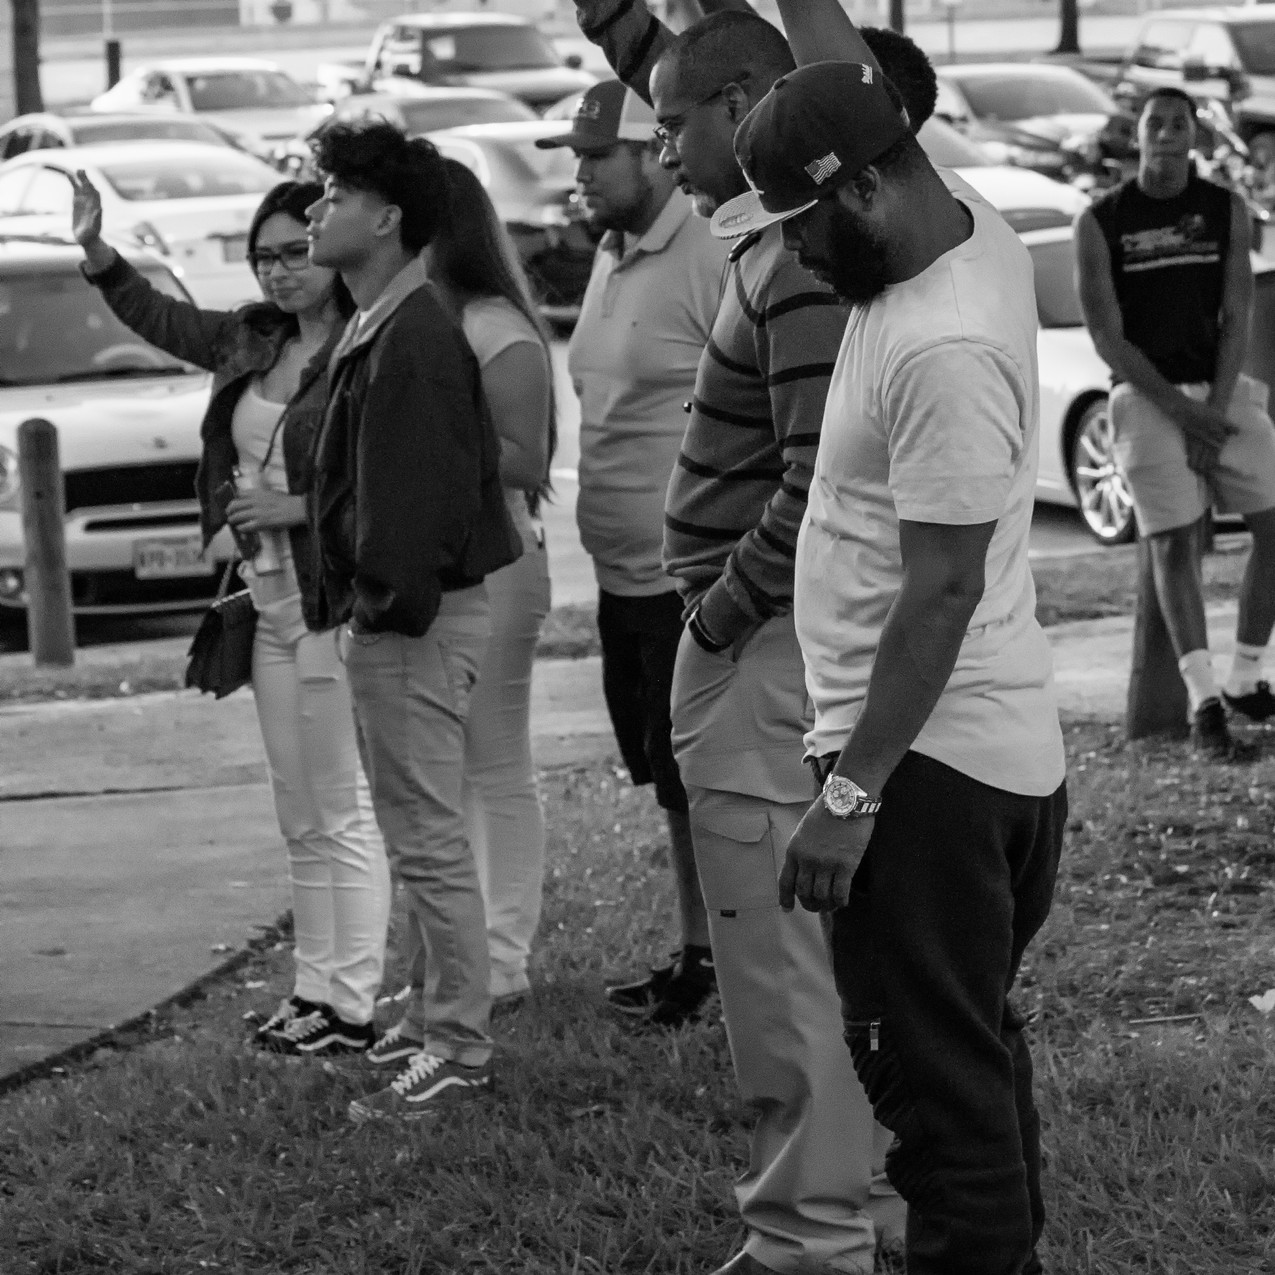 Darian Bolden Candlelight Vigil Houston Texas Hiram Clarke G Photography Arlington Photographer Gwendolyn Houston Jack